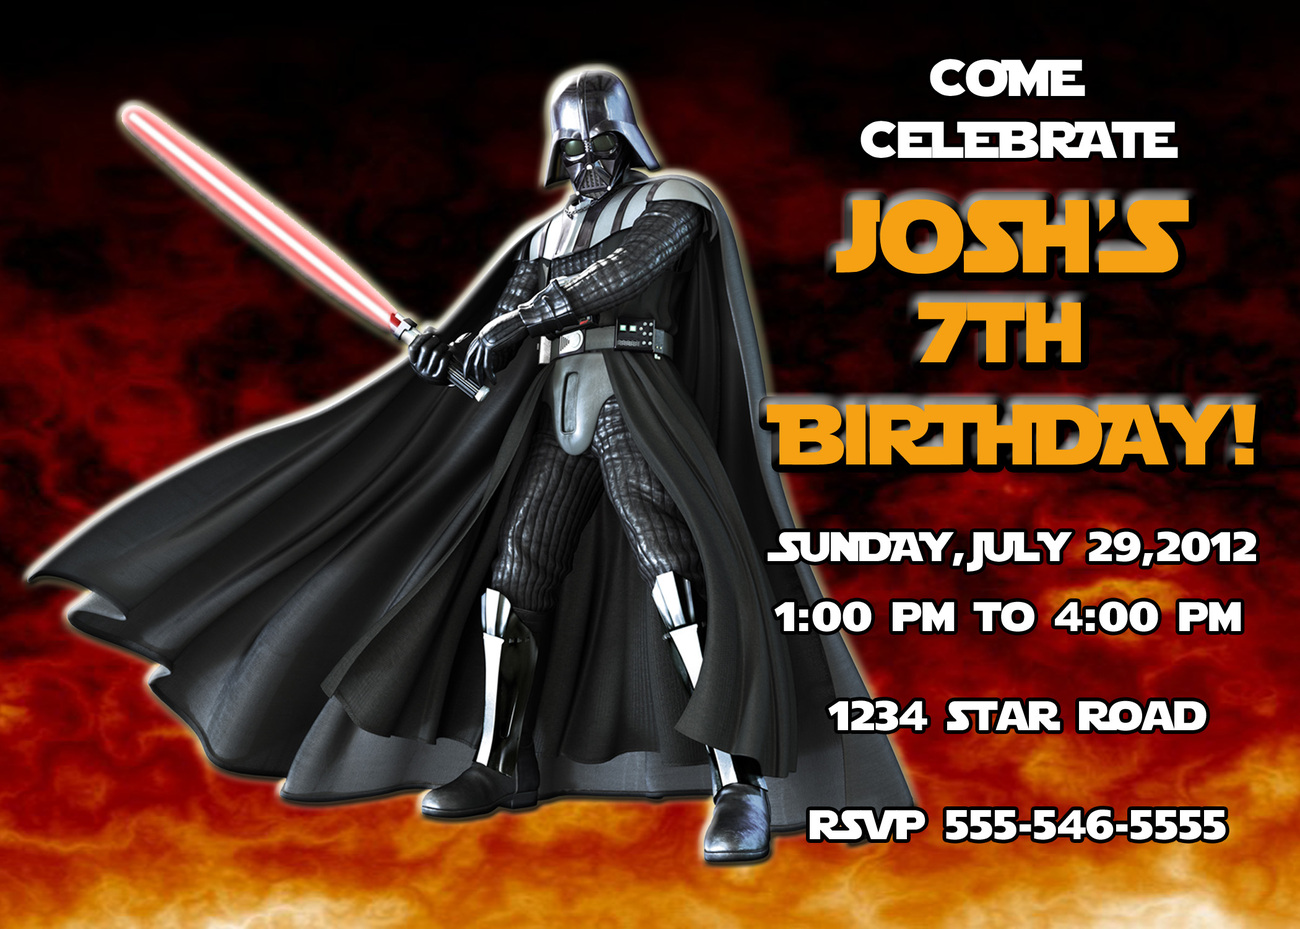 Personalized Star Wars Darth Vader Birthday Invitation Digital File ...: www.bonanza.com/listings/Personalized-Star-Wars-Darth-Vader...